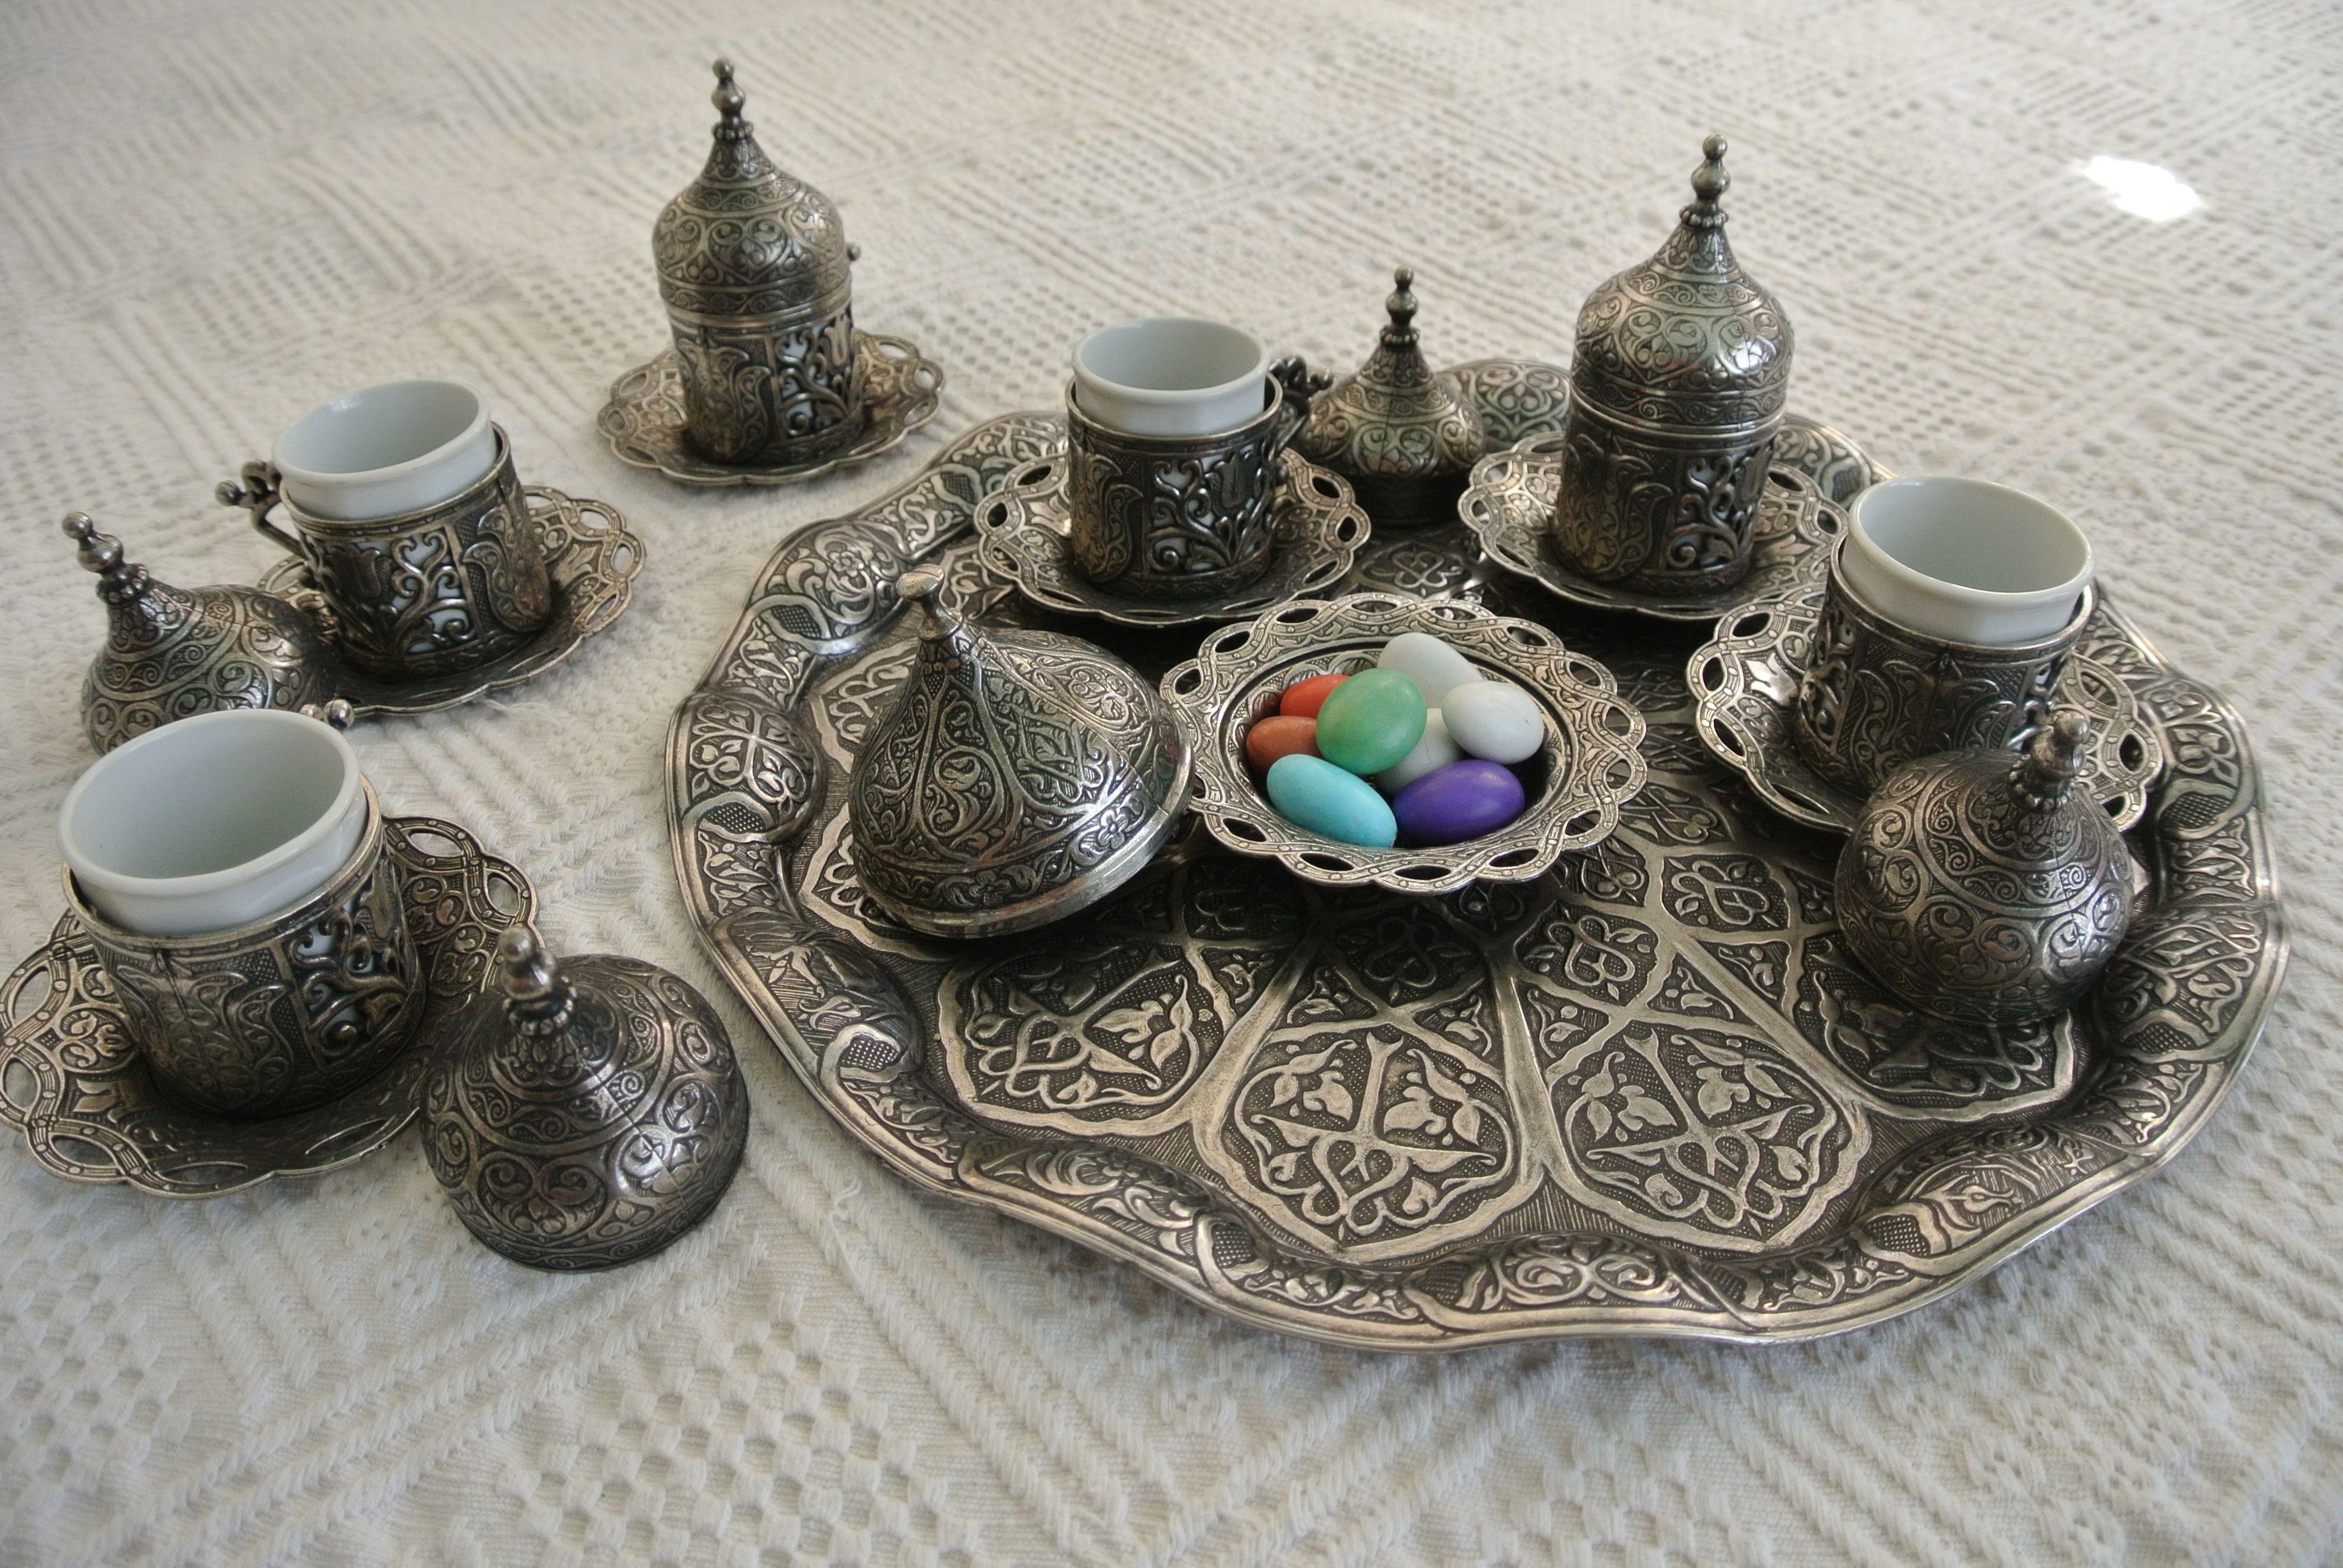 Details about TURKISH COFFEE SET Mugs Porcelain Cups Bowl